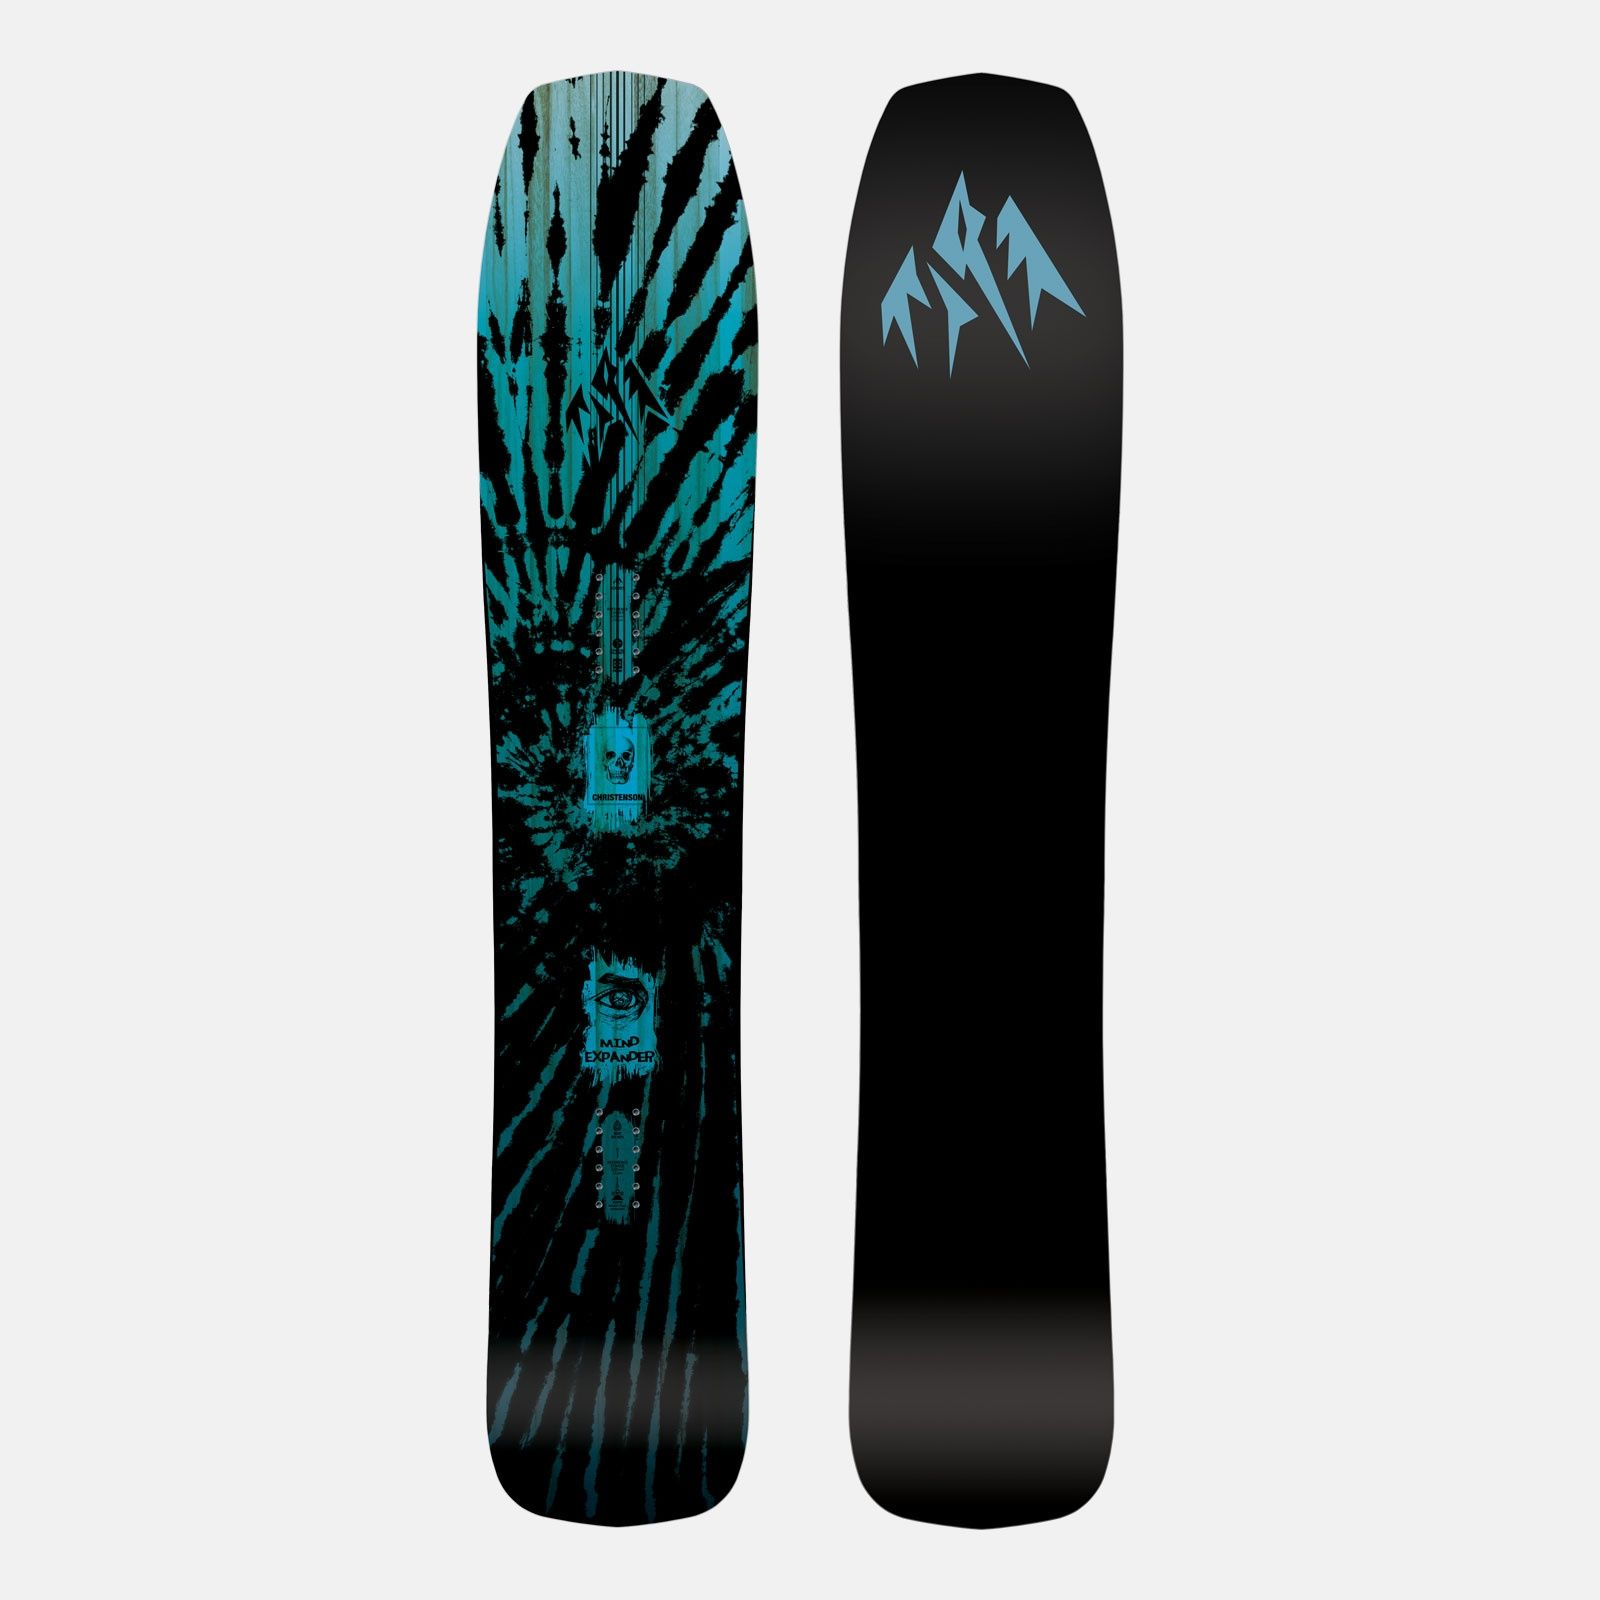 Jones Snowboard Mind Expander 2021